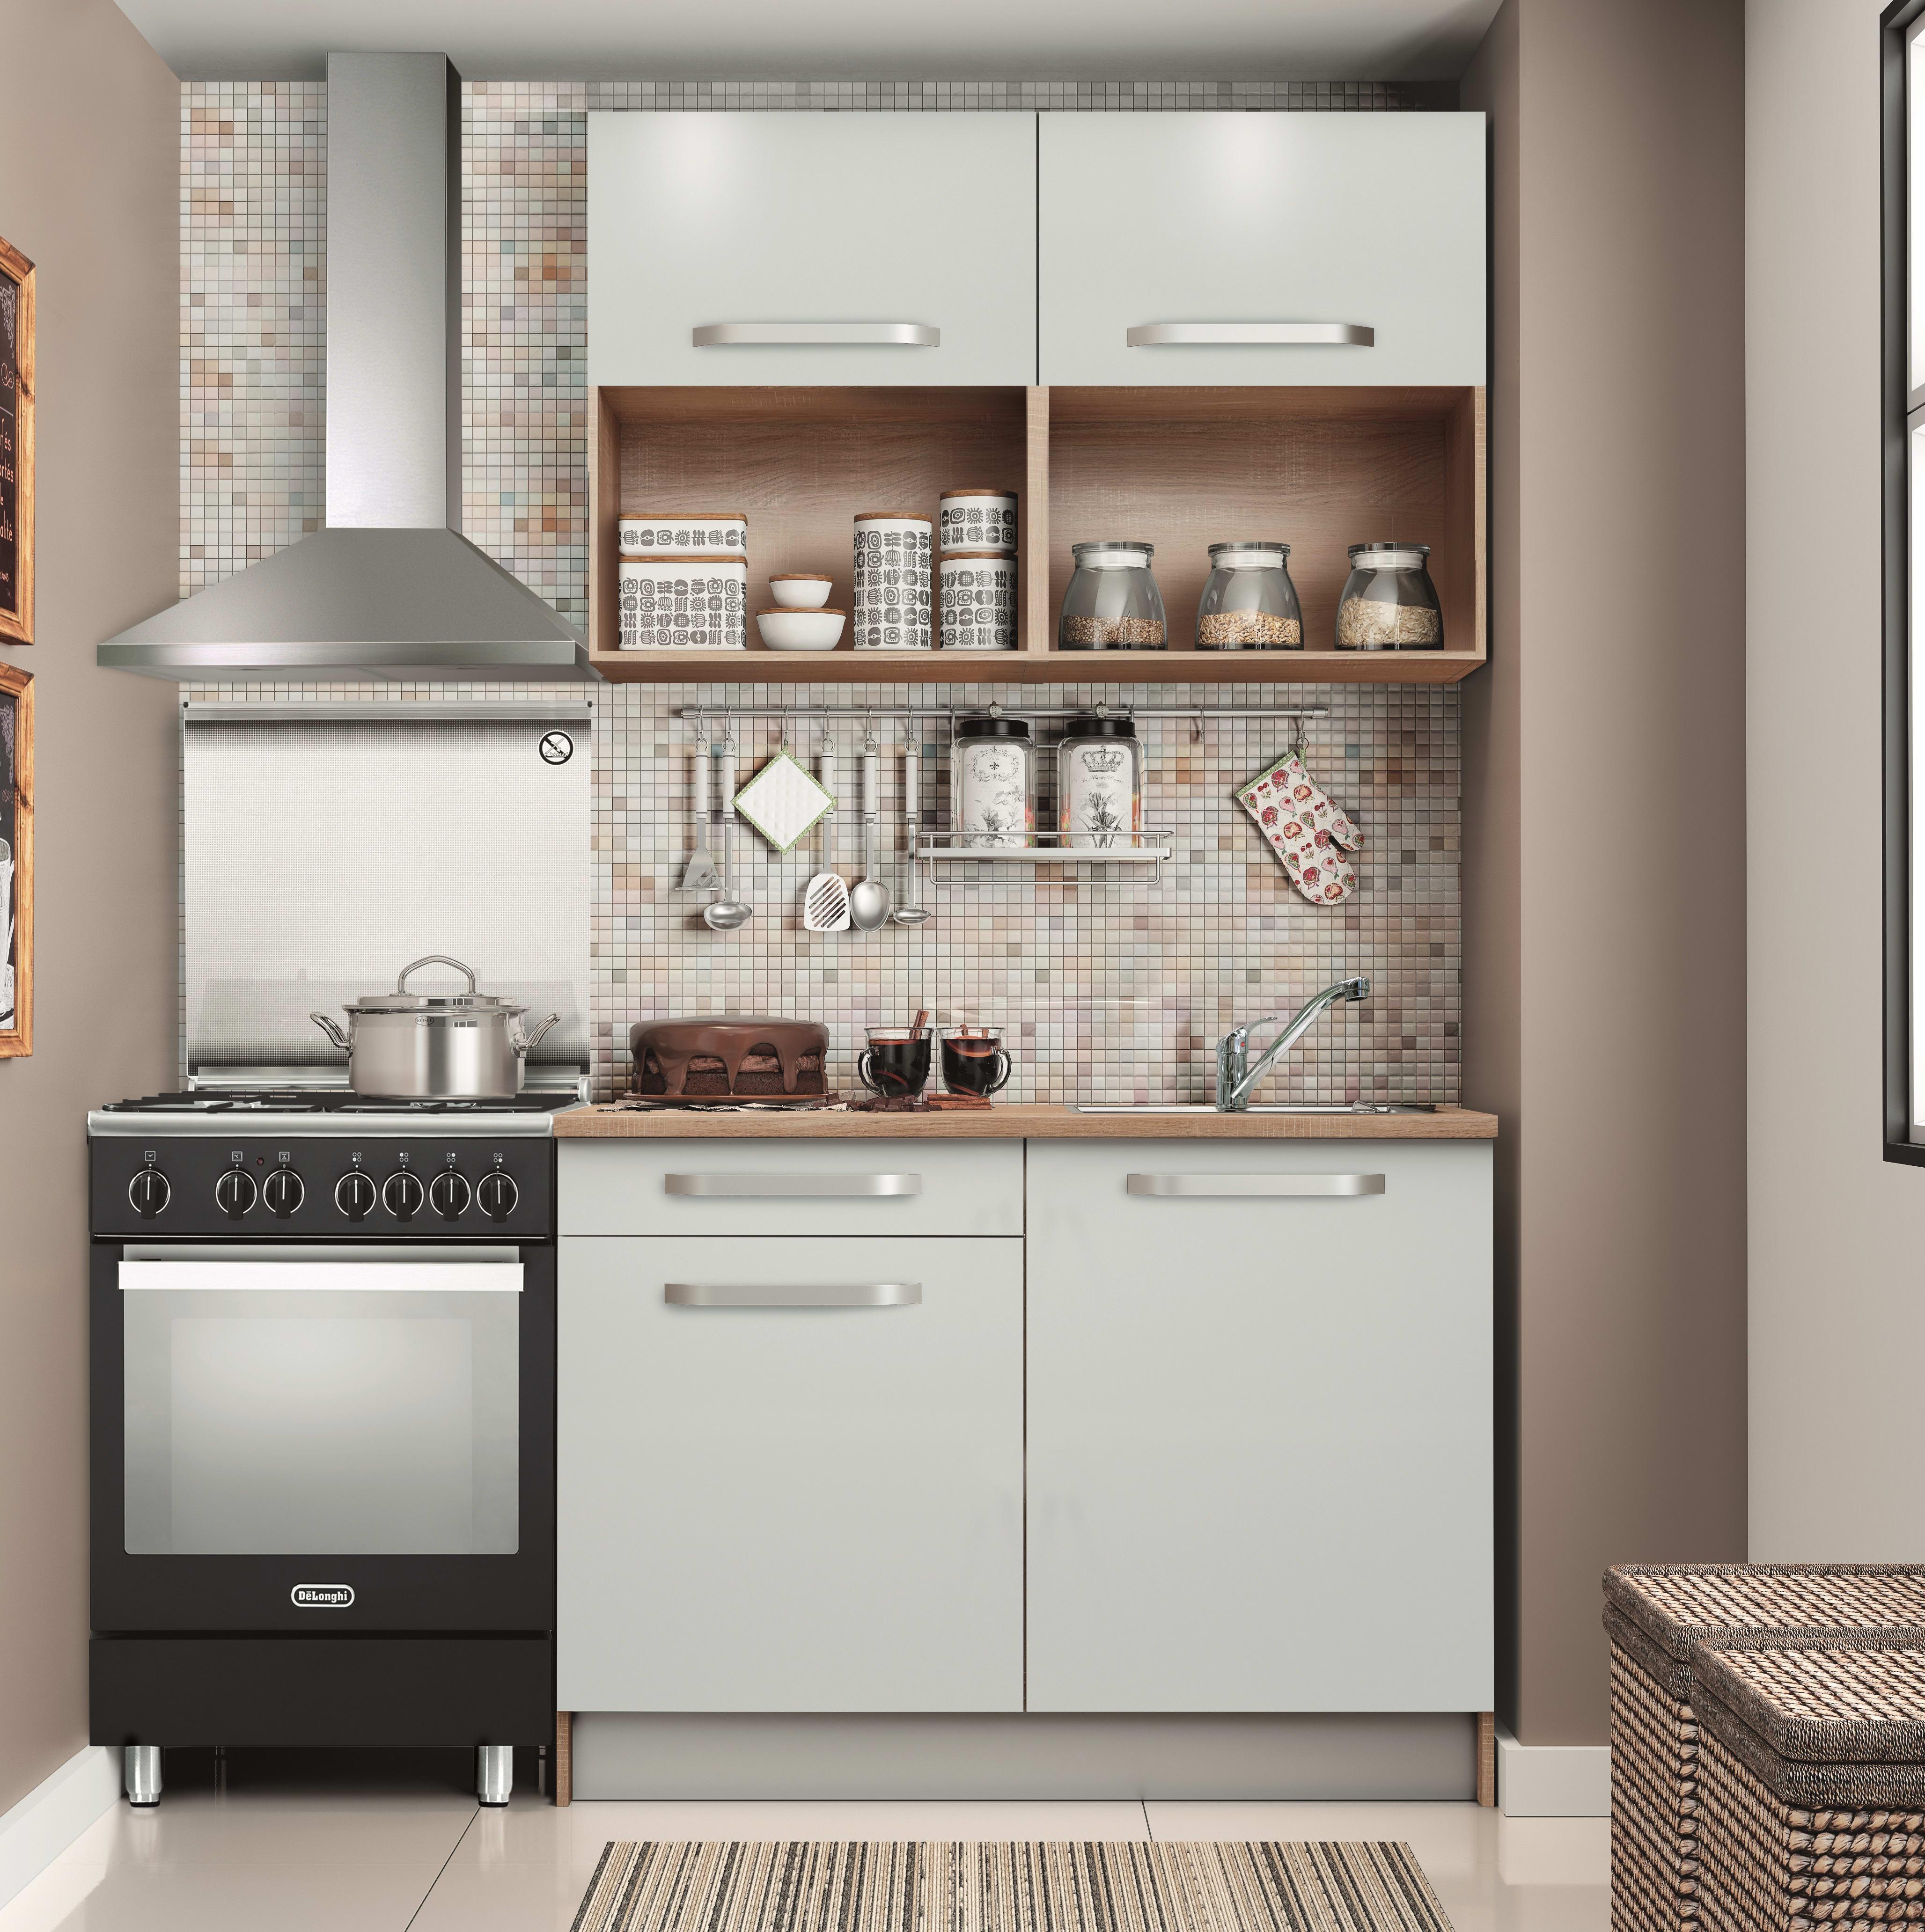 Cucina One Bianco L 120 Cm Prezzi E Offerte Online Leroy Merlin